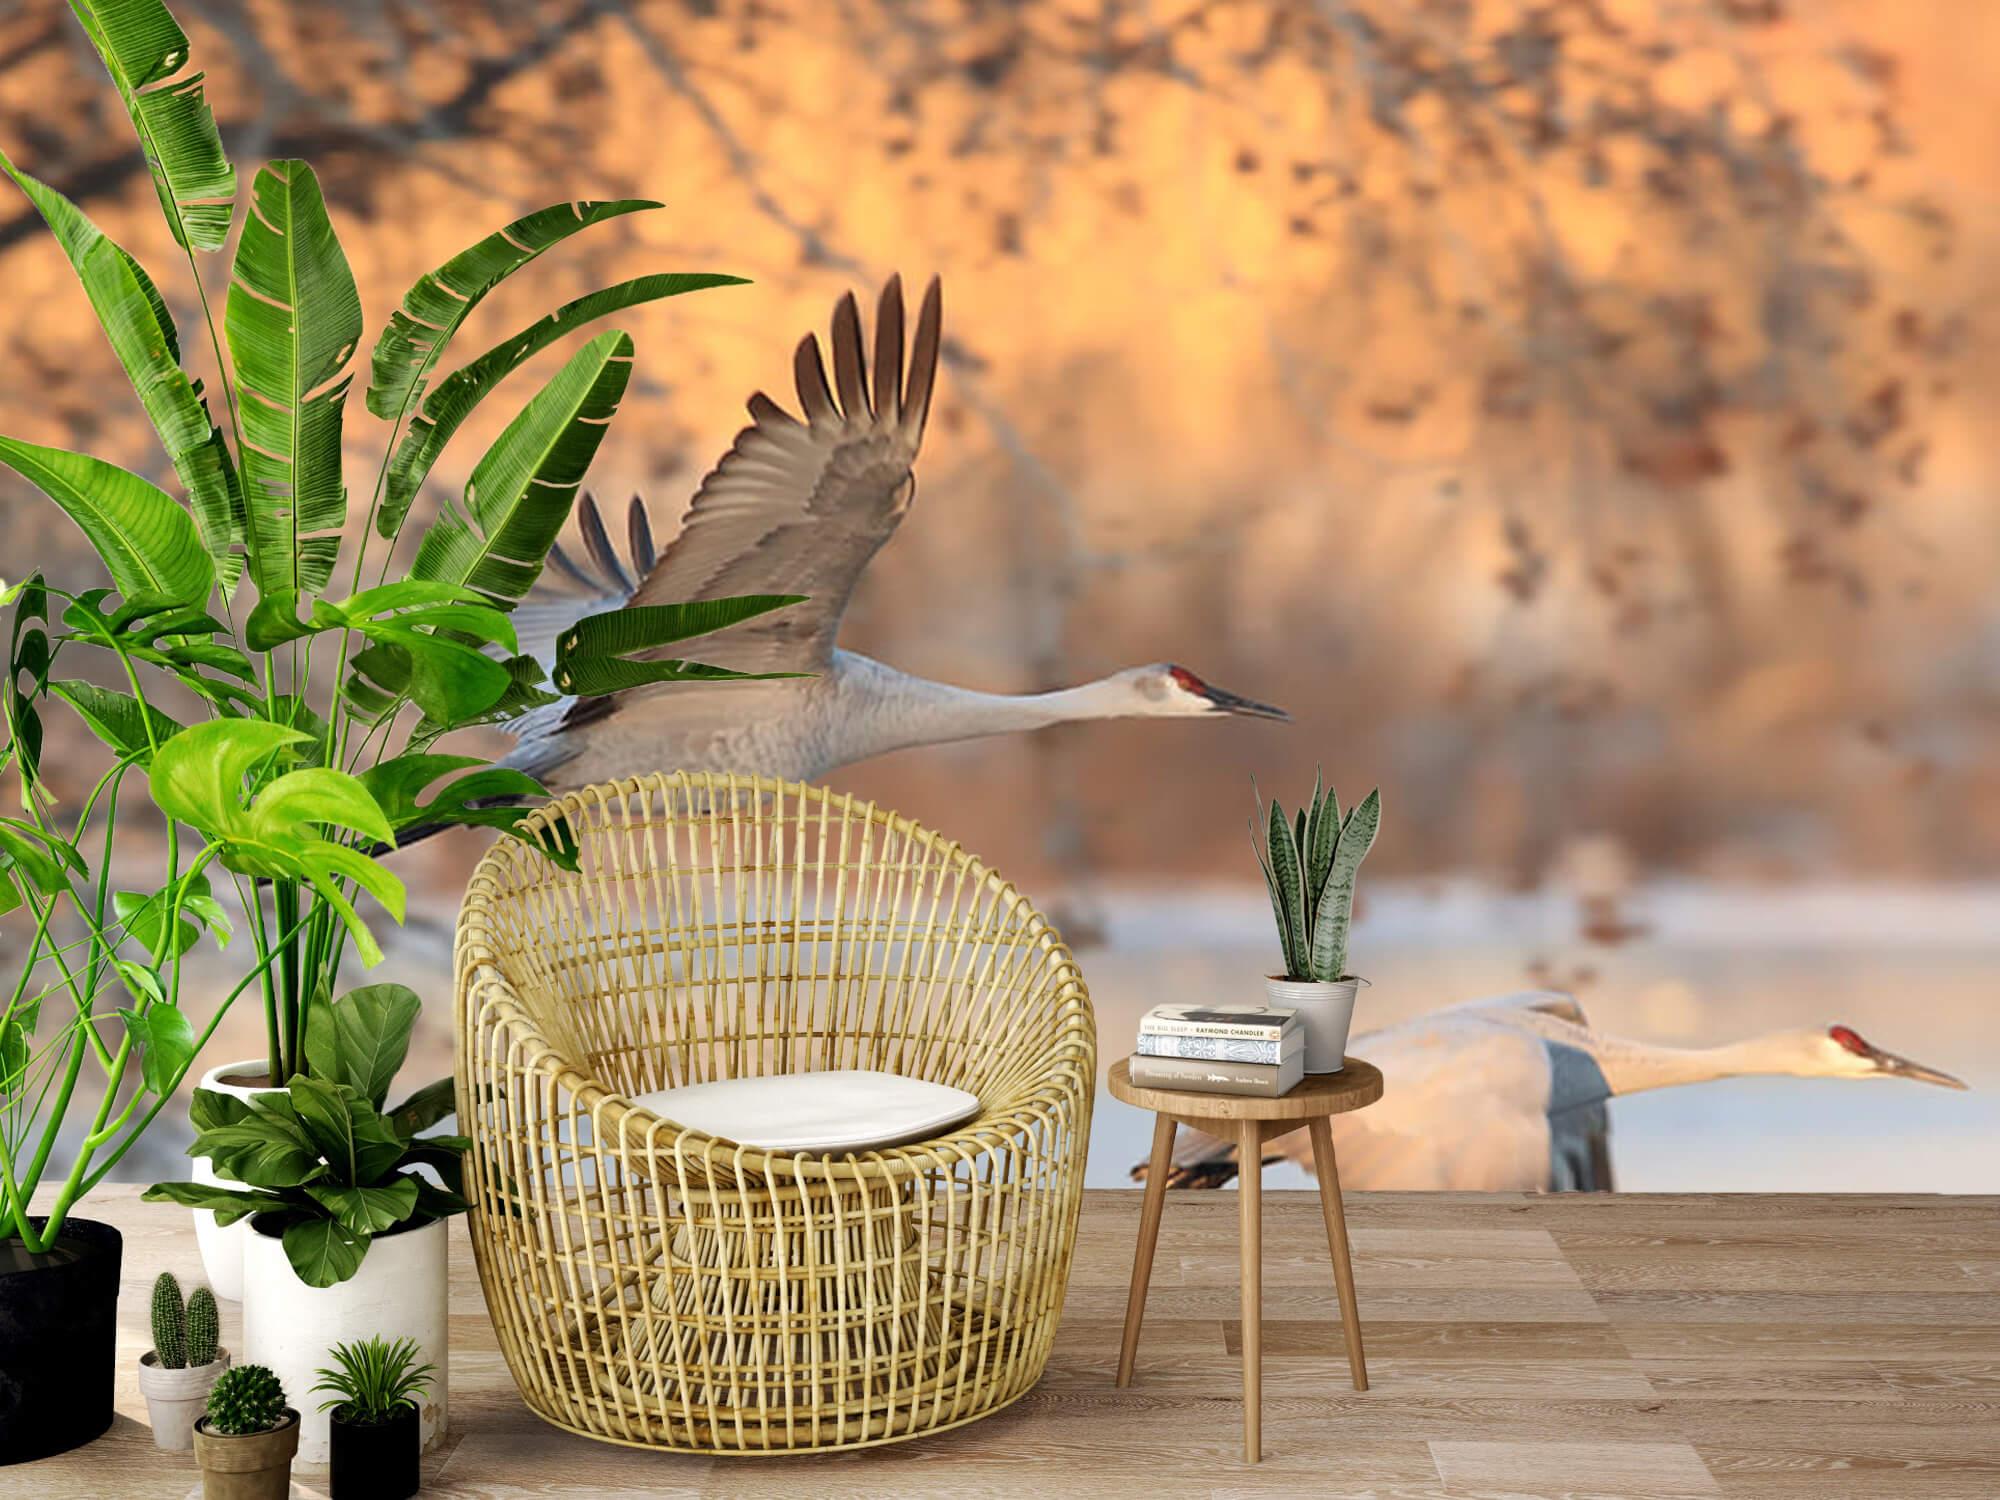 Vliegende kraanvogels 7